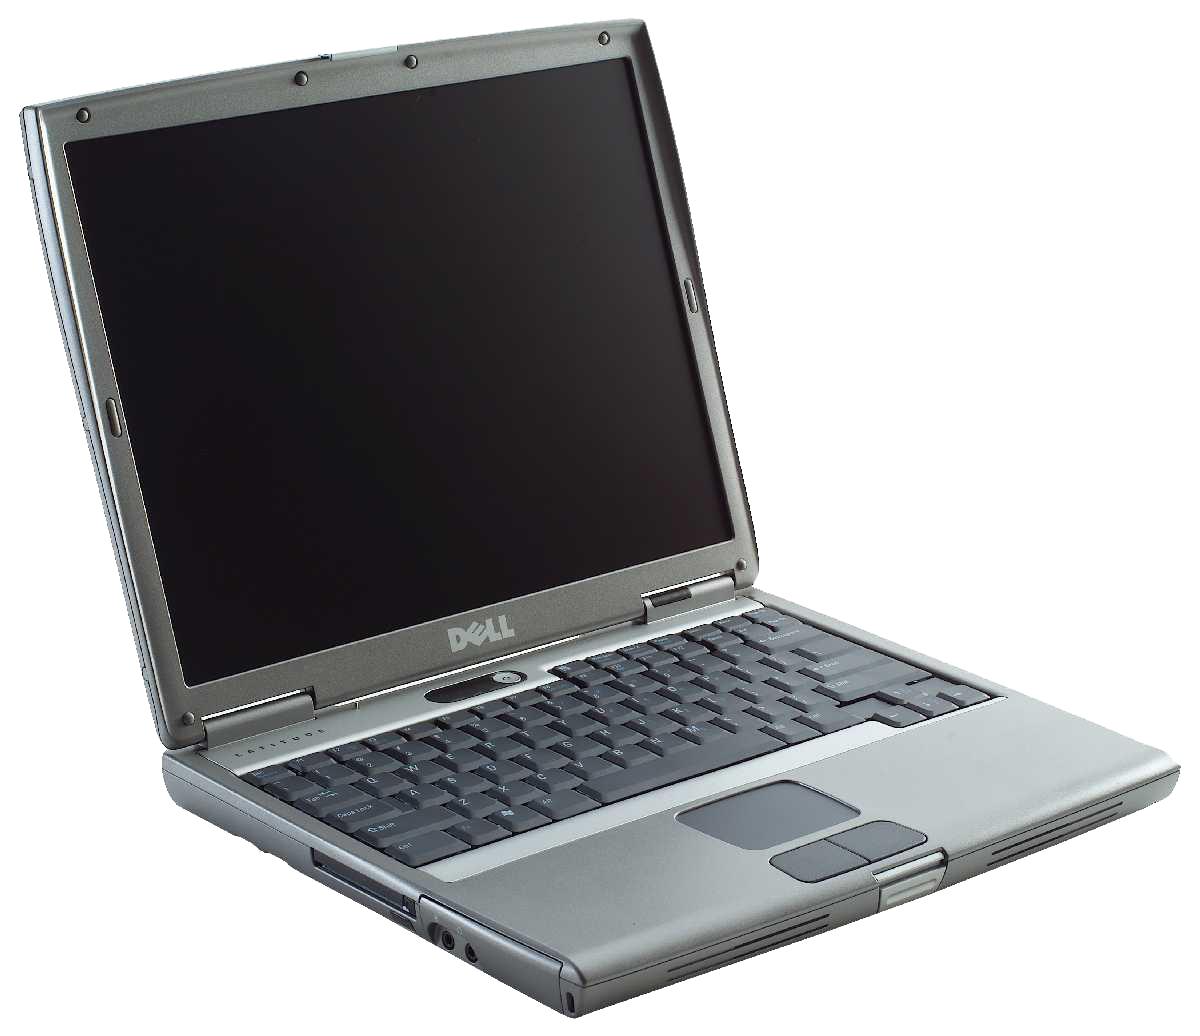 Dell latitude d610 drivers for windows 7, 8, 10 os 32-bit 64-bit.